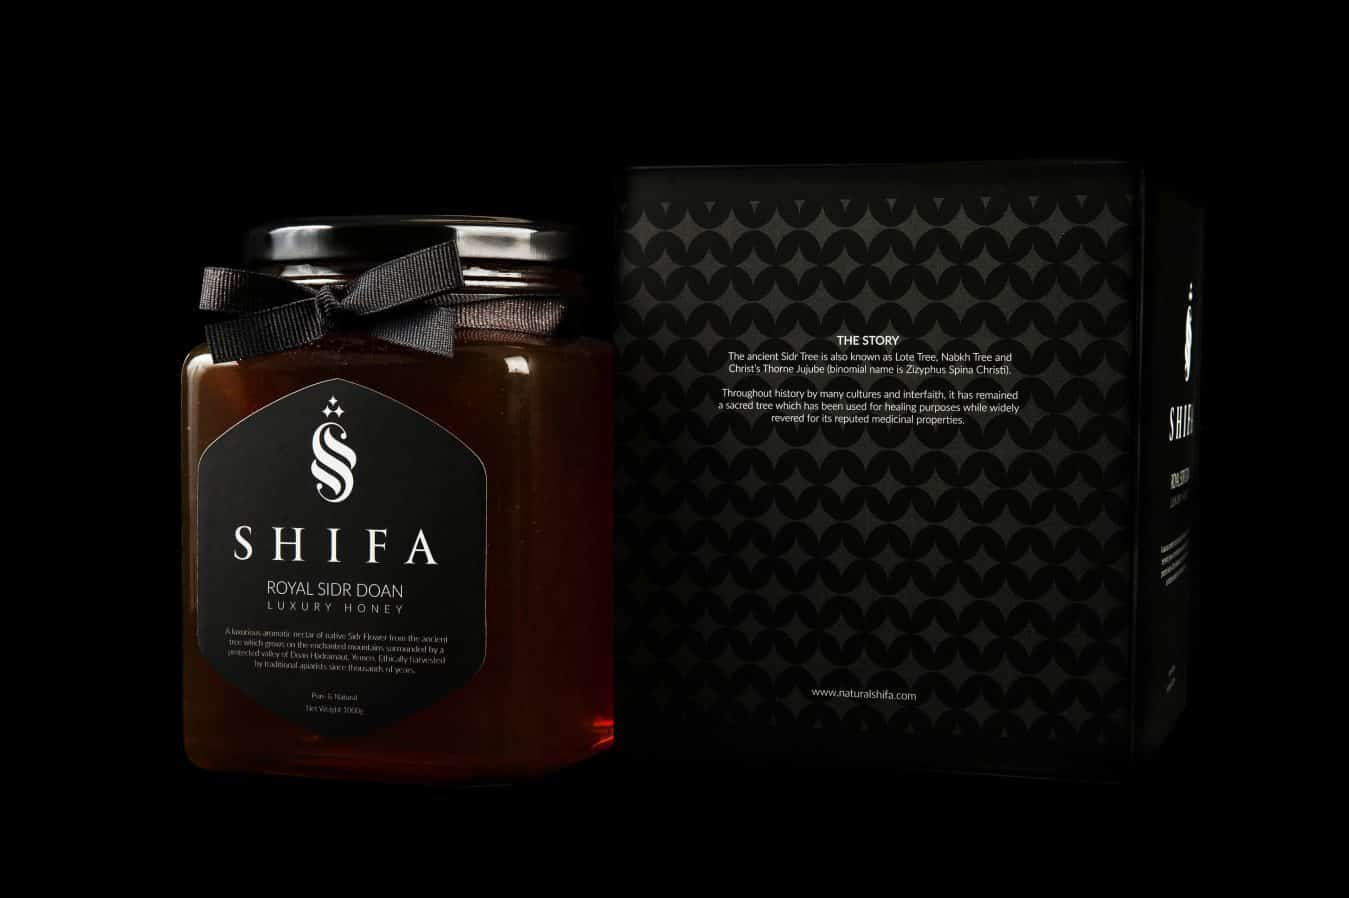 Shifa Royal Sidr Doan Honey - 7